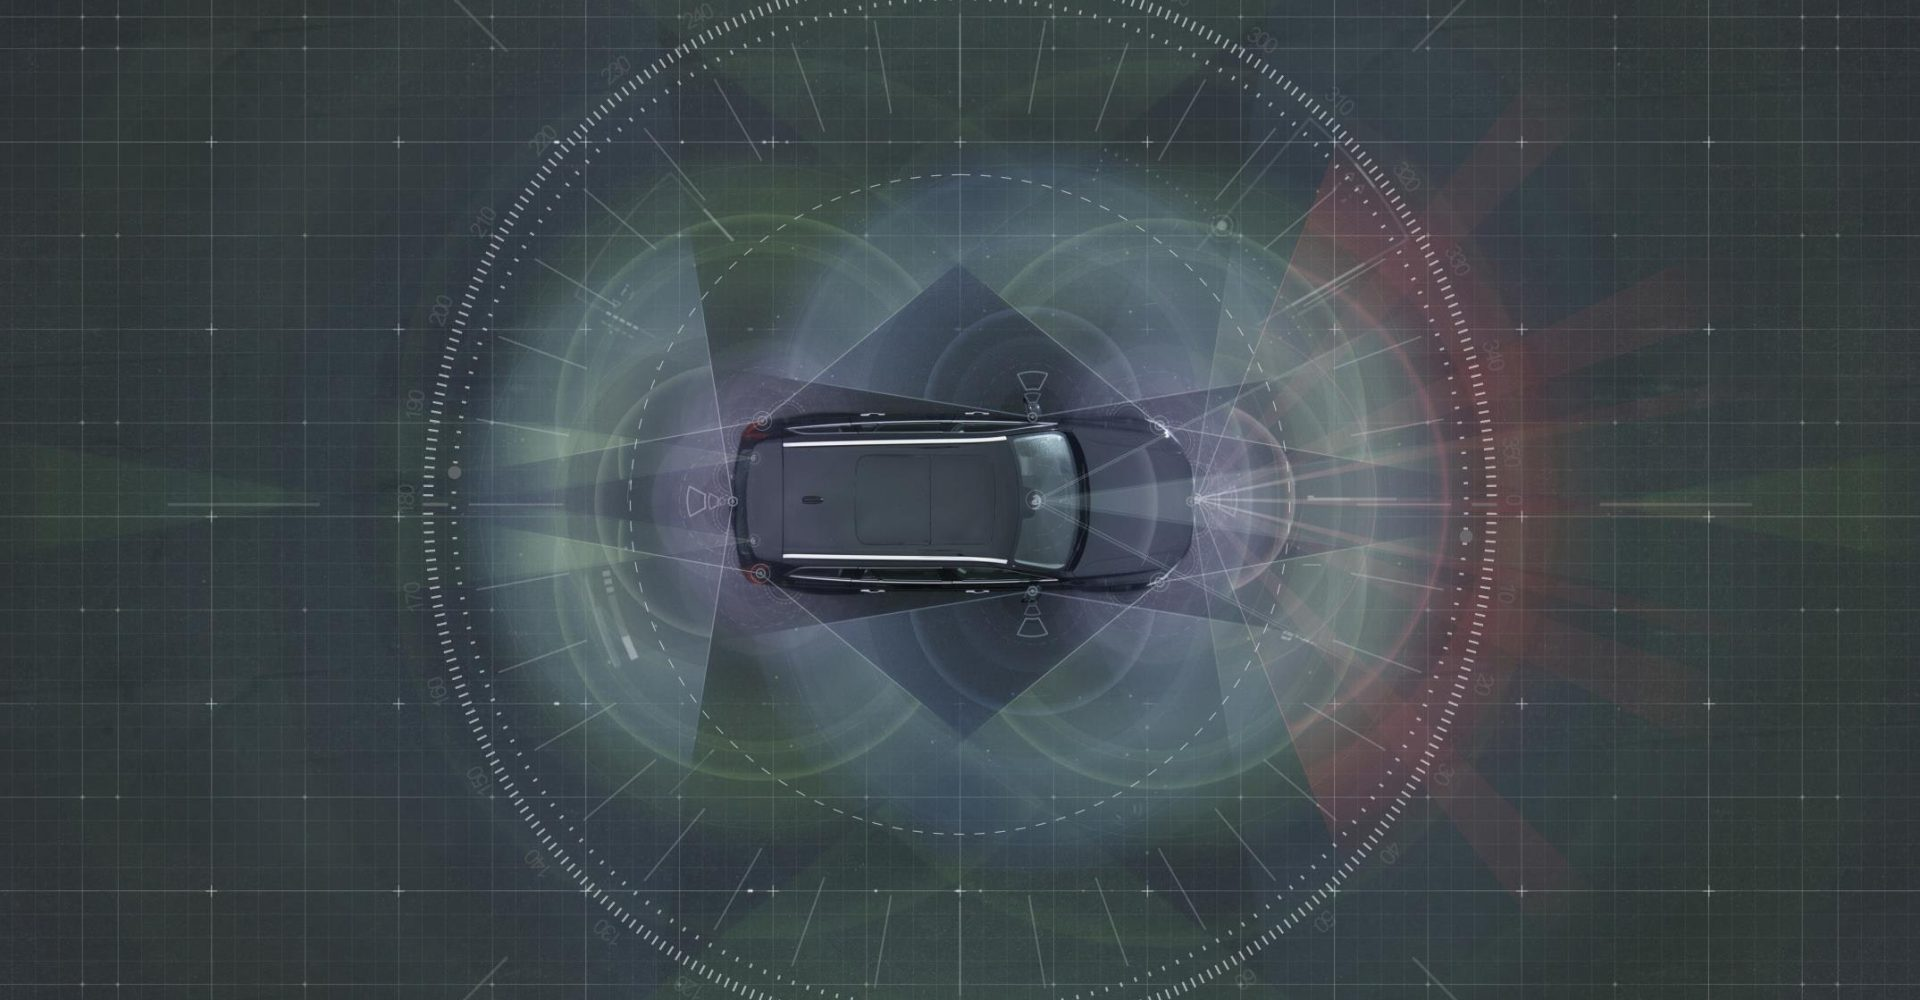 Volvo accelerates development of unsupervised autonomous driving technology